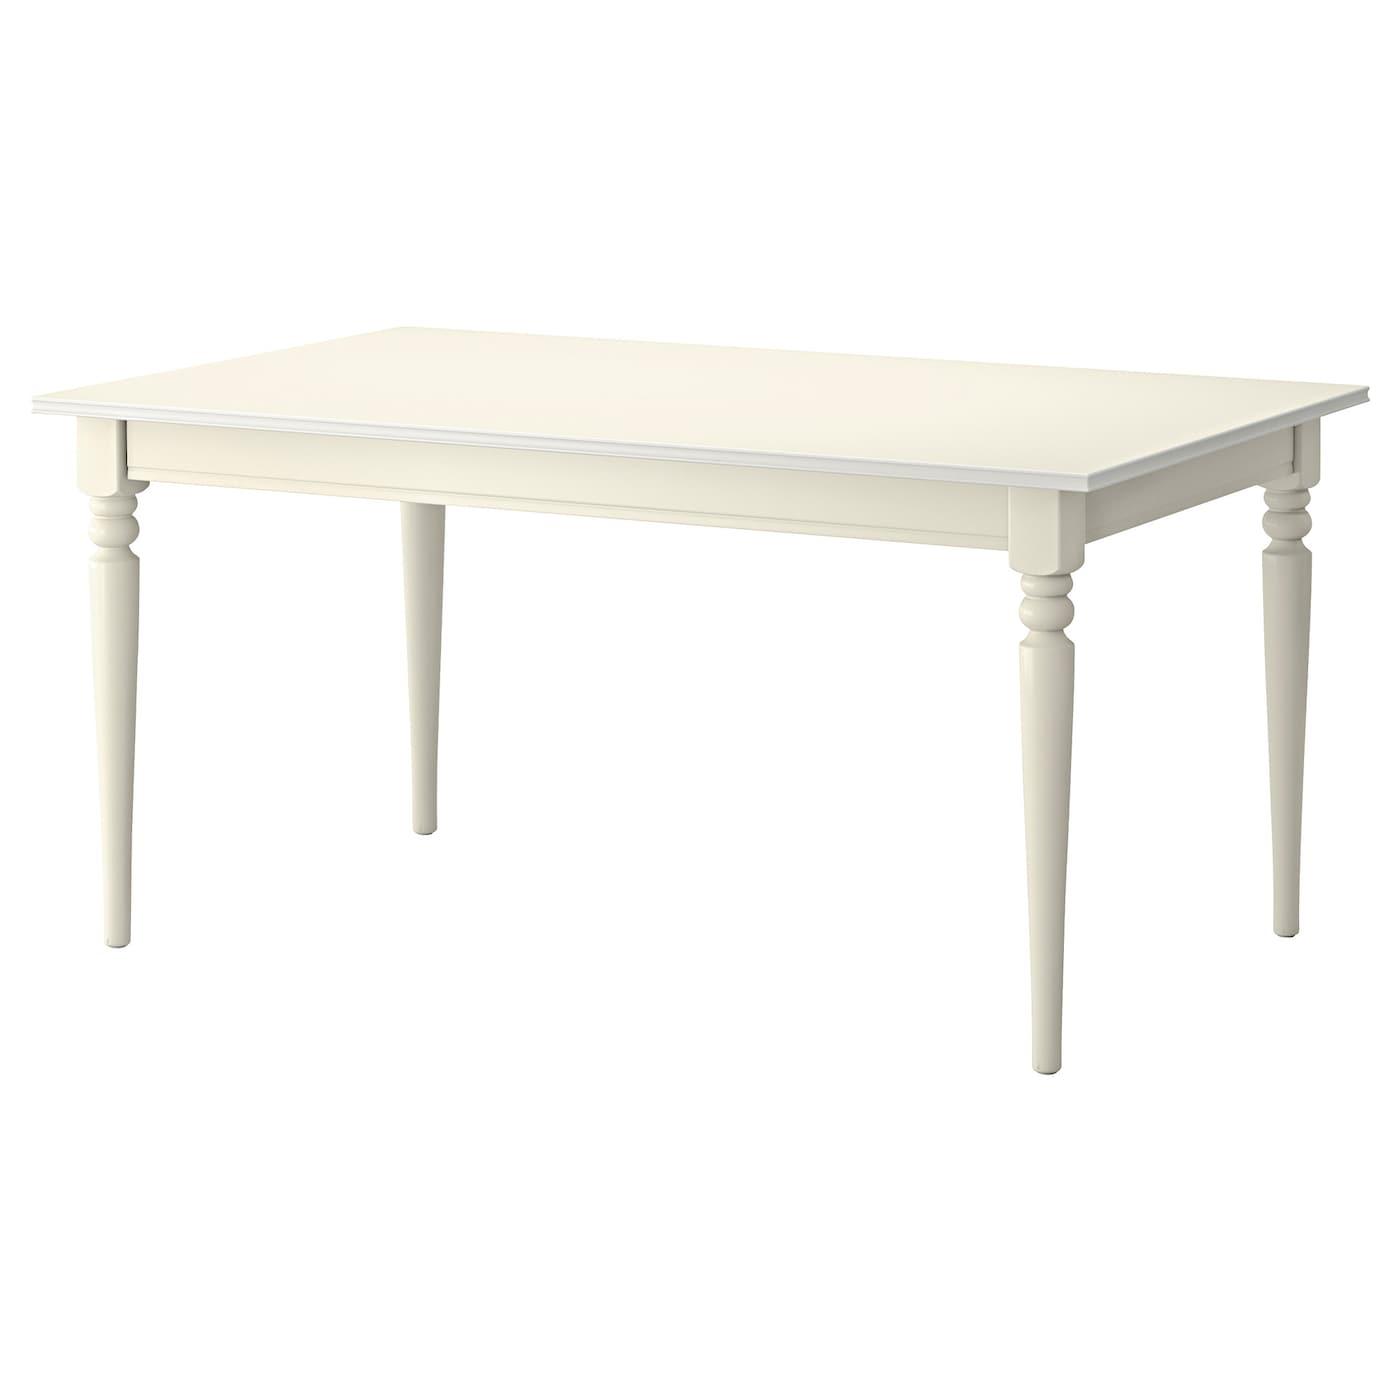 Eetkamertafel Hout Wit.Eettafels Kopen Keukentafel Eetkamertafel Ikea